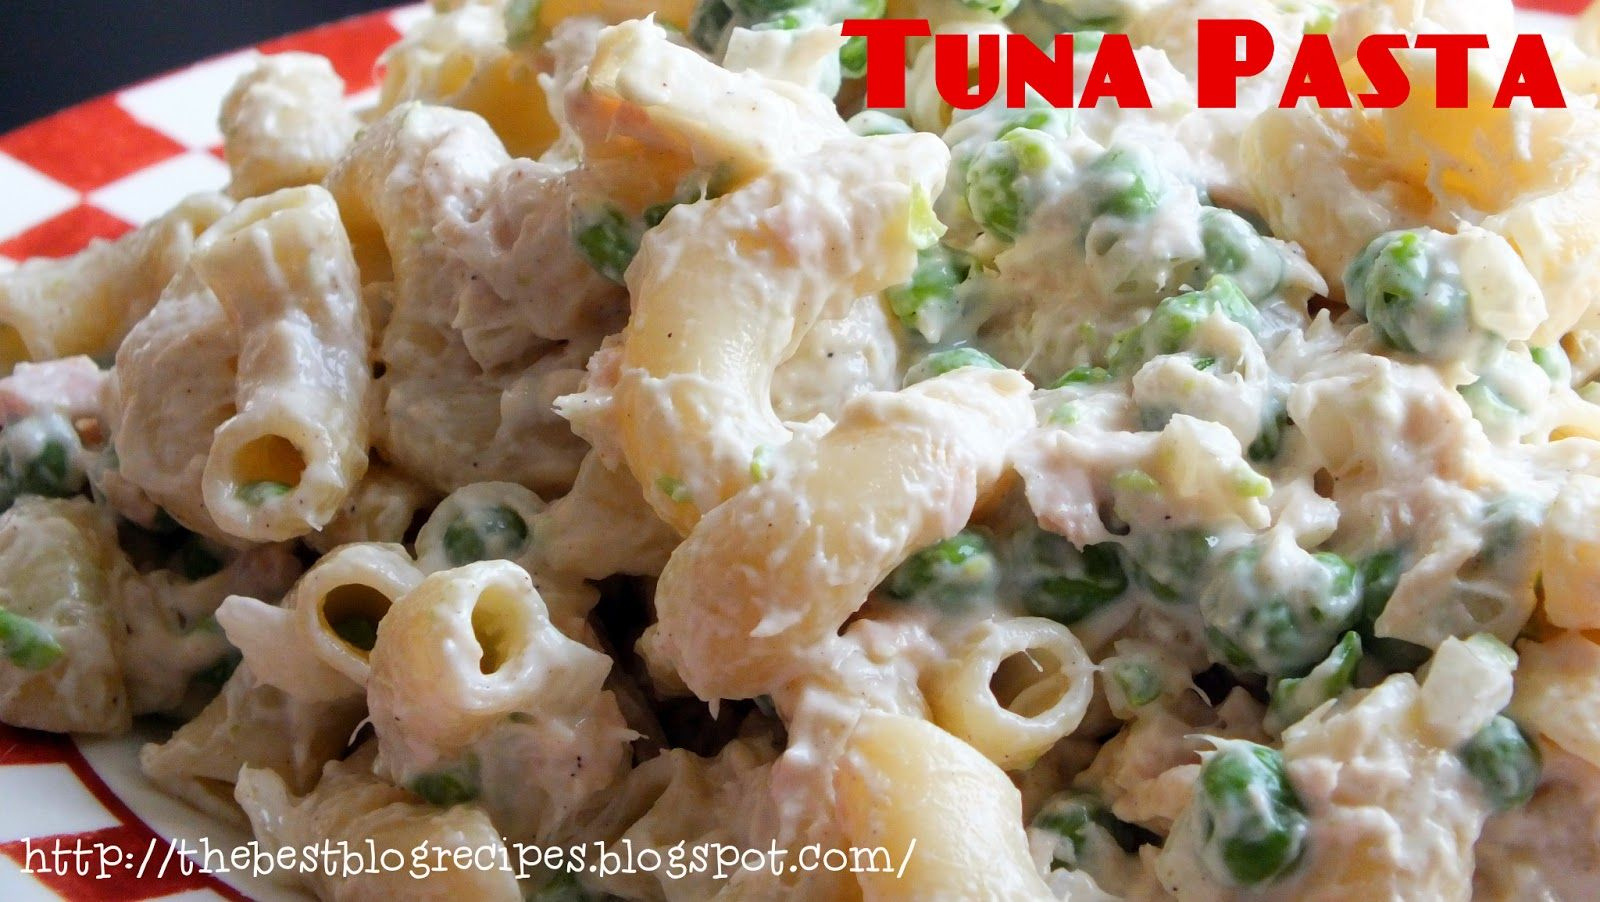 Tuna Pasta Cold Tuna Pasta Tuna And Pasta